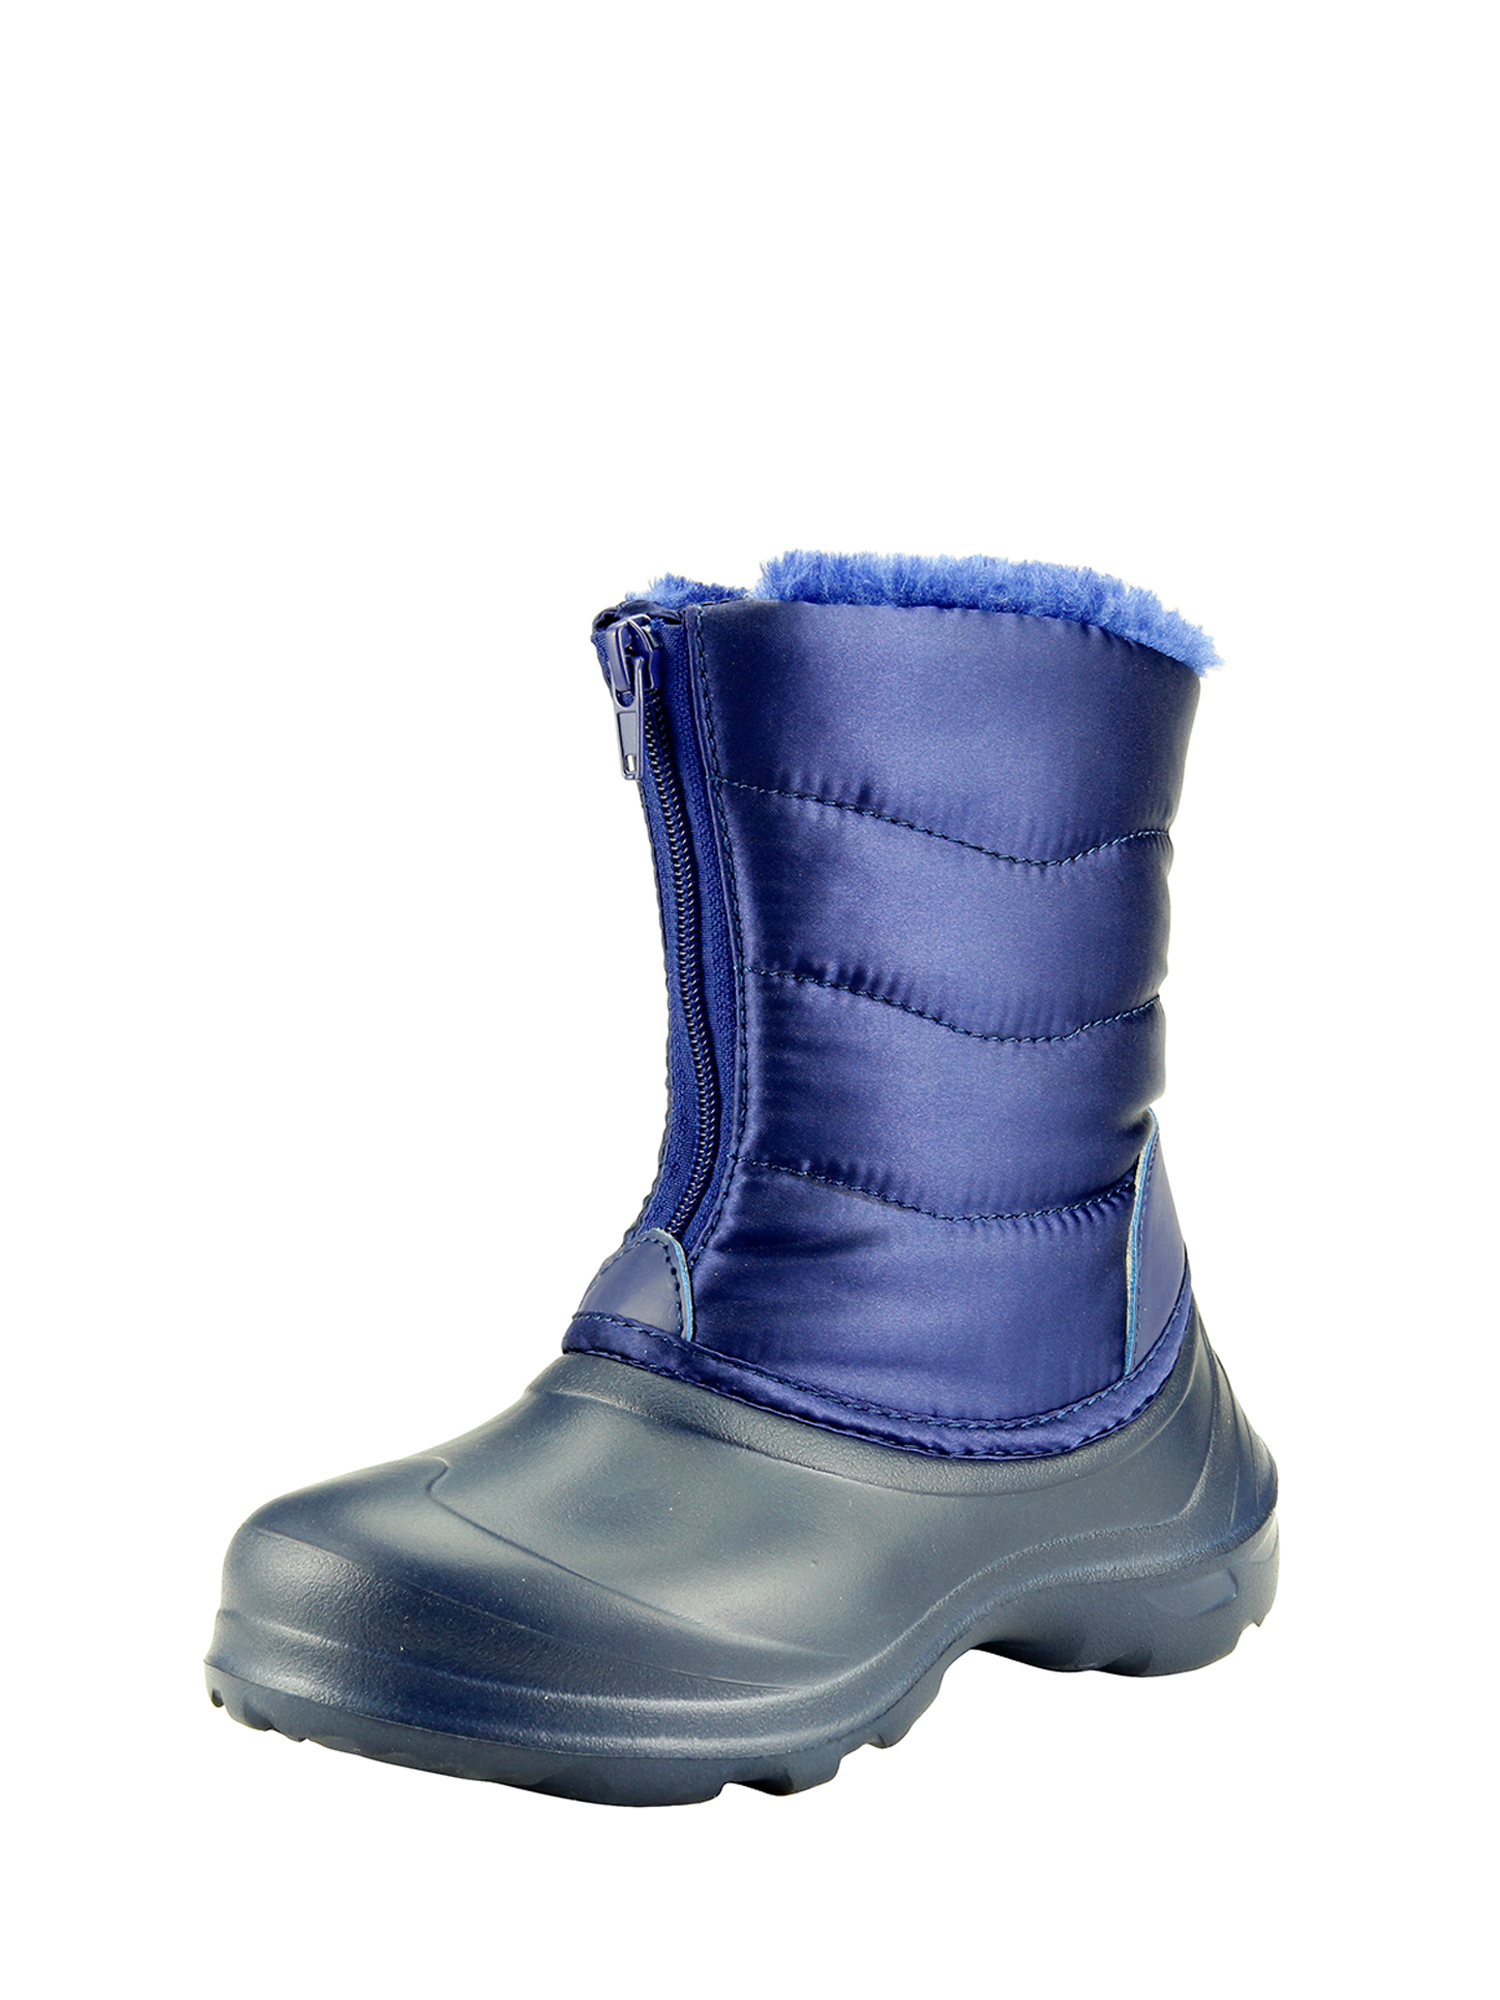 Boy's Snow Boot-TD174002B-7